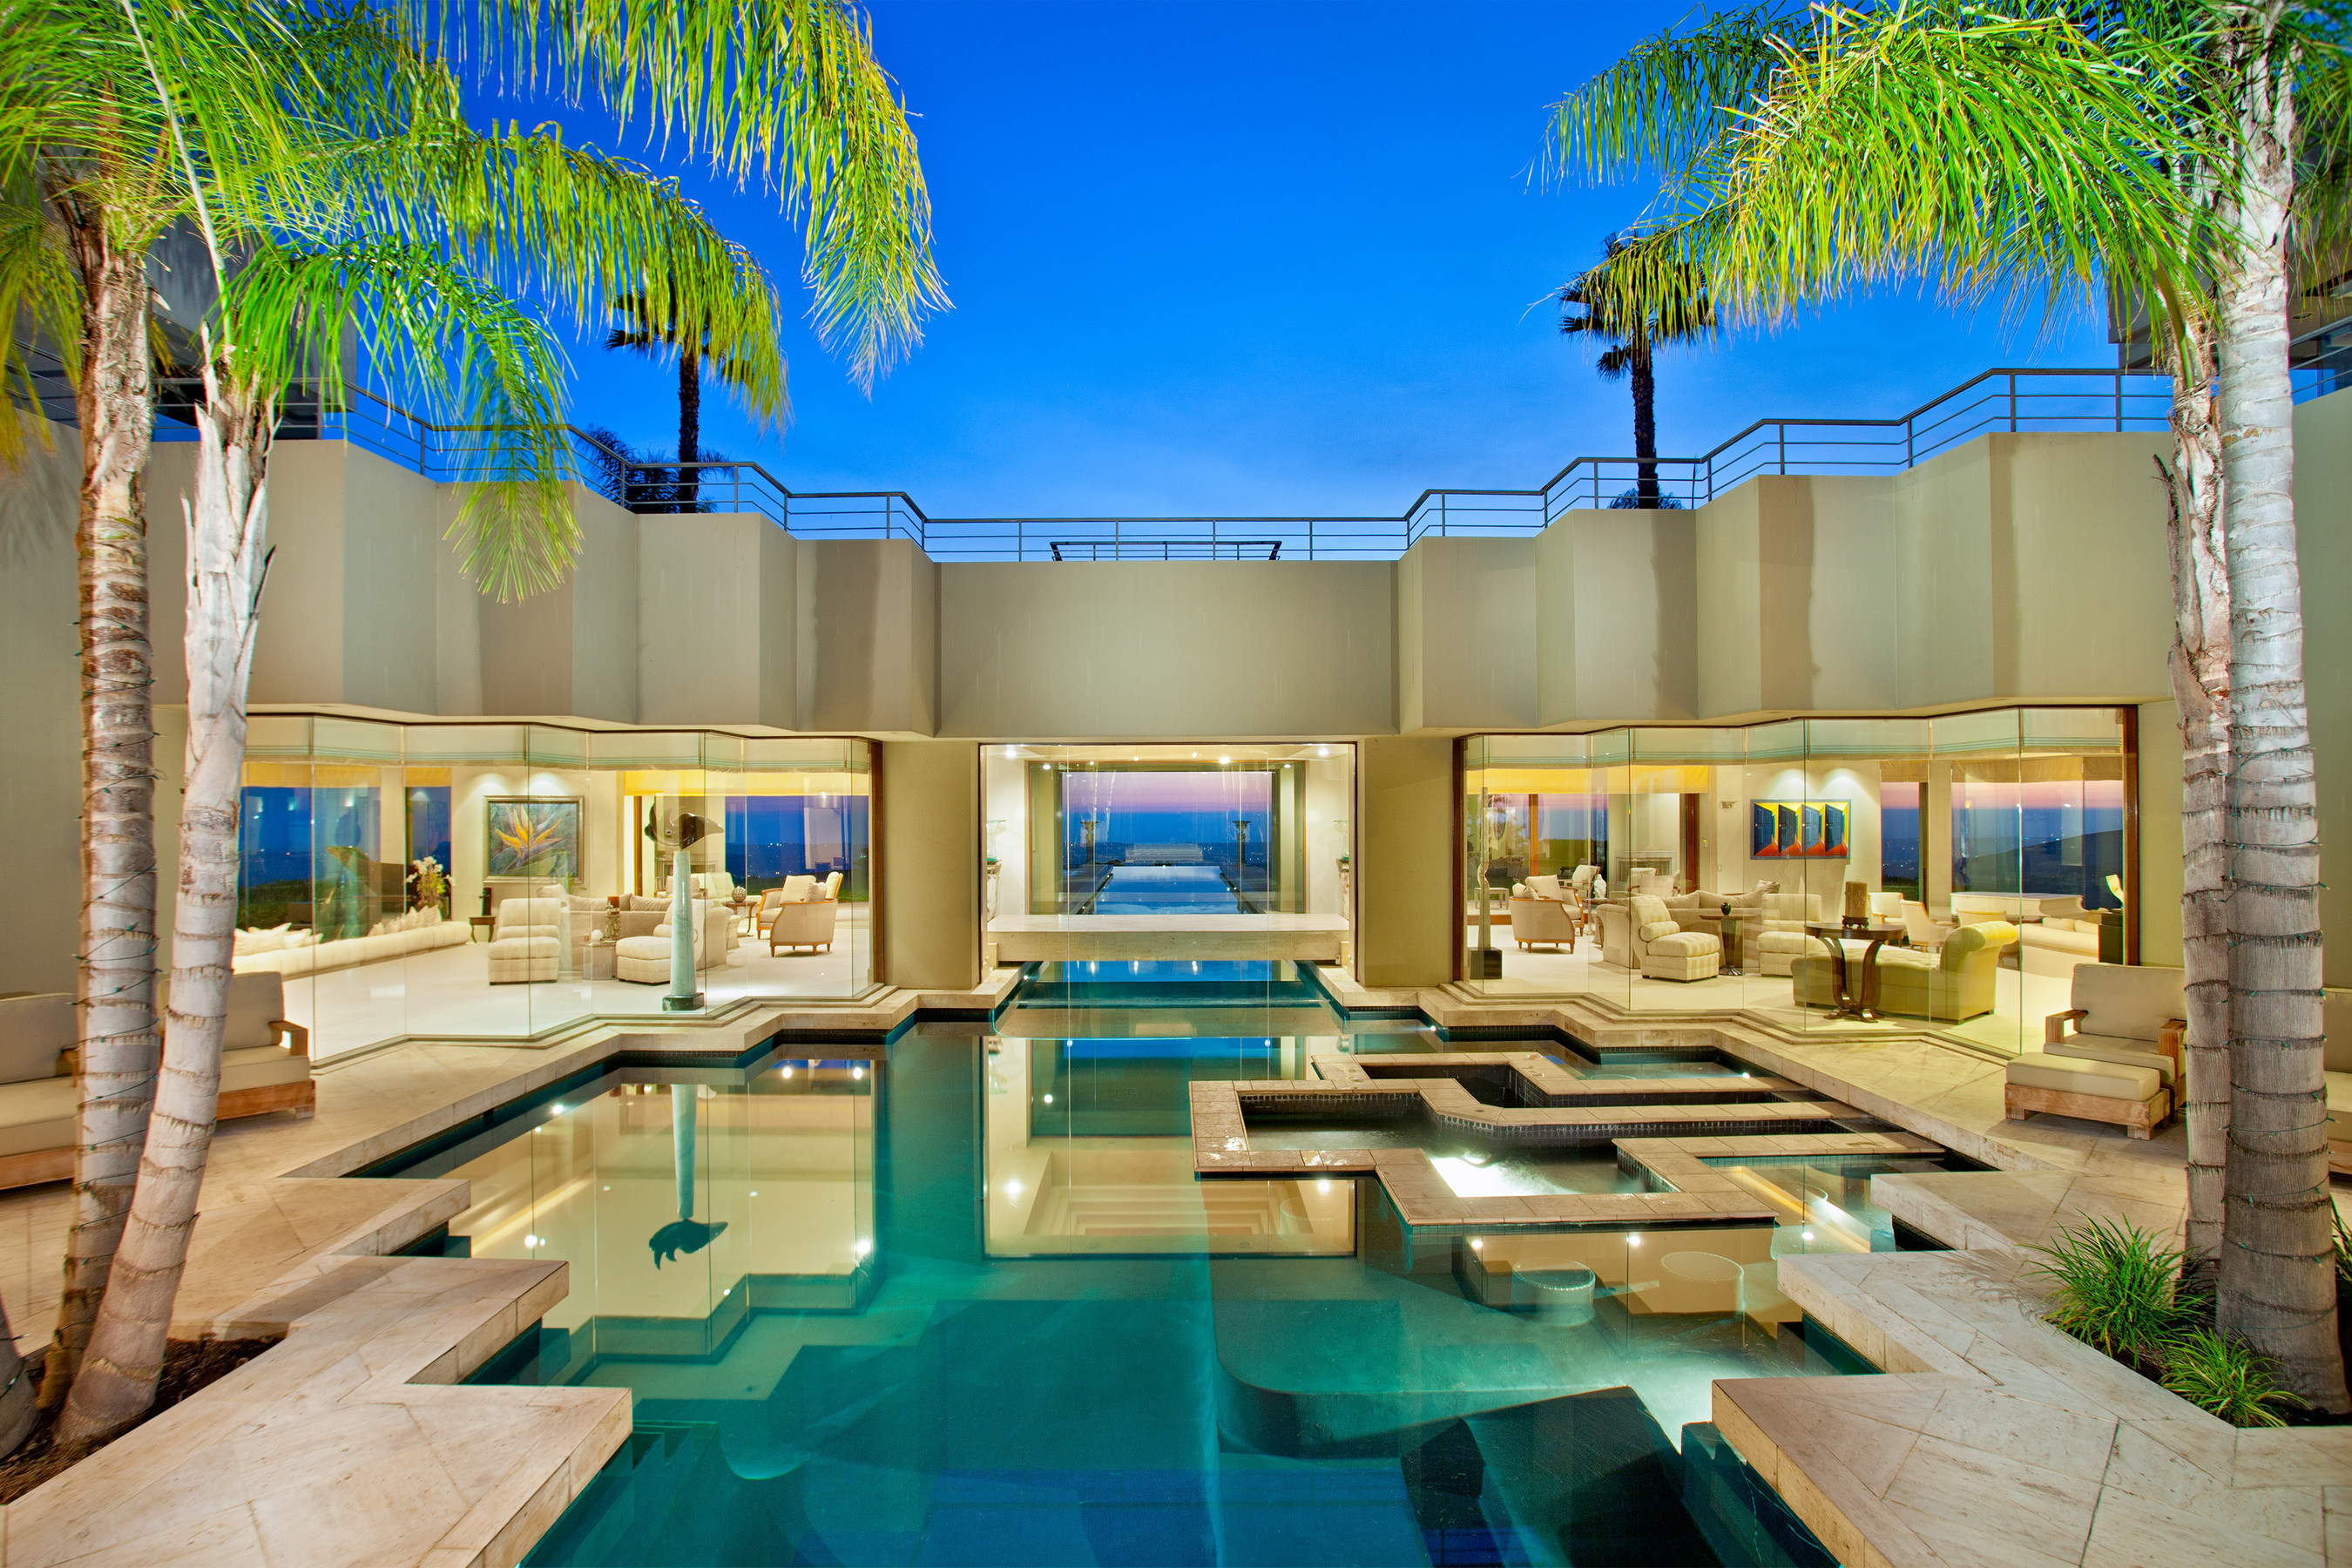 Platinum Luxury Auctions Announces Auction of Exotic California Mountaintop Estate